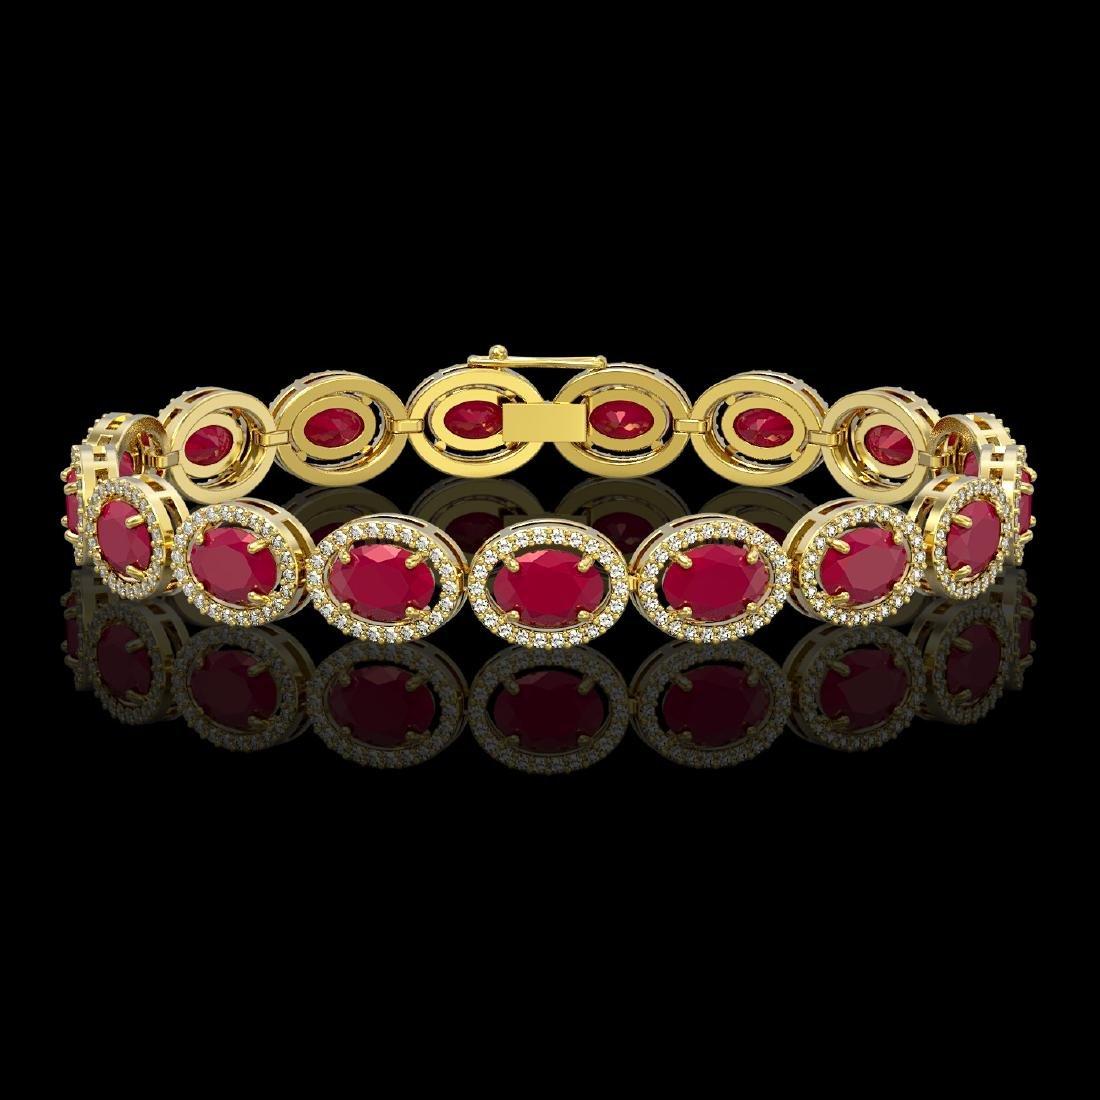 22.89 CTW Ruby & Diamond Halo Bracelet 10K Yellow Gold